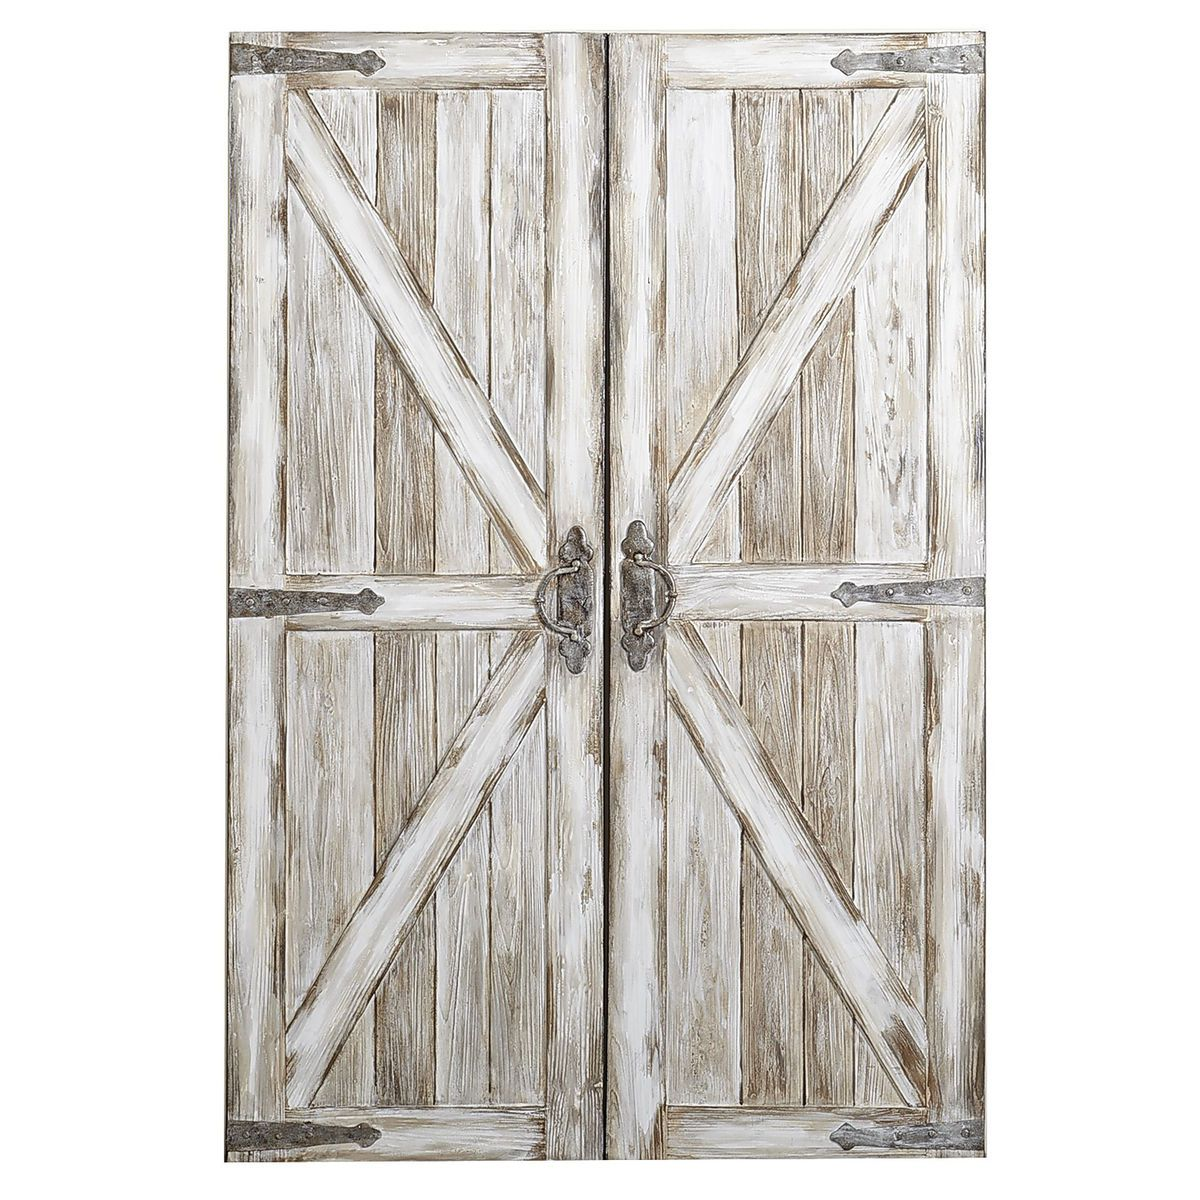 Antique white rustic barn doors art closet barn wood doors